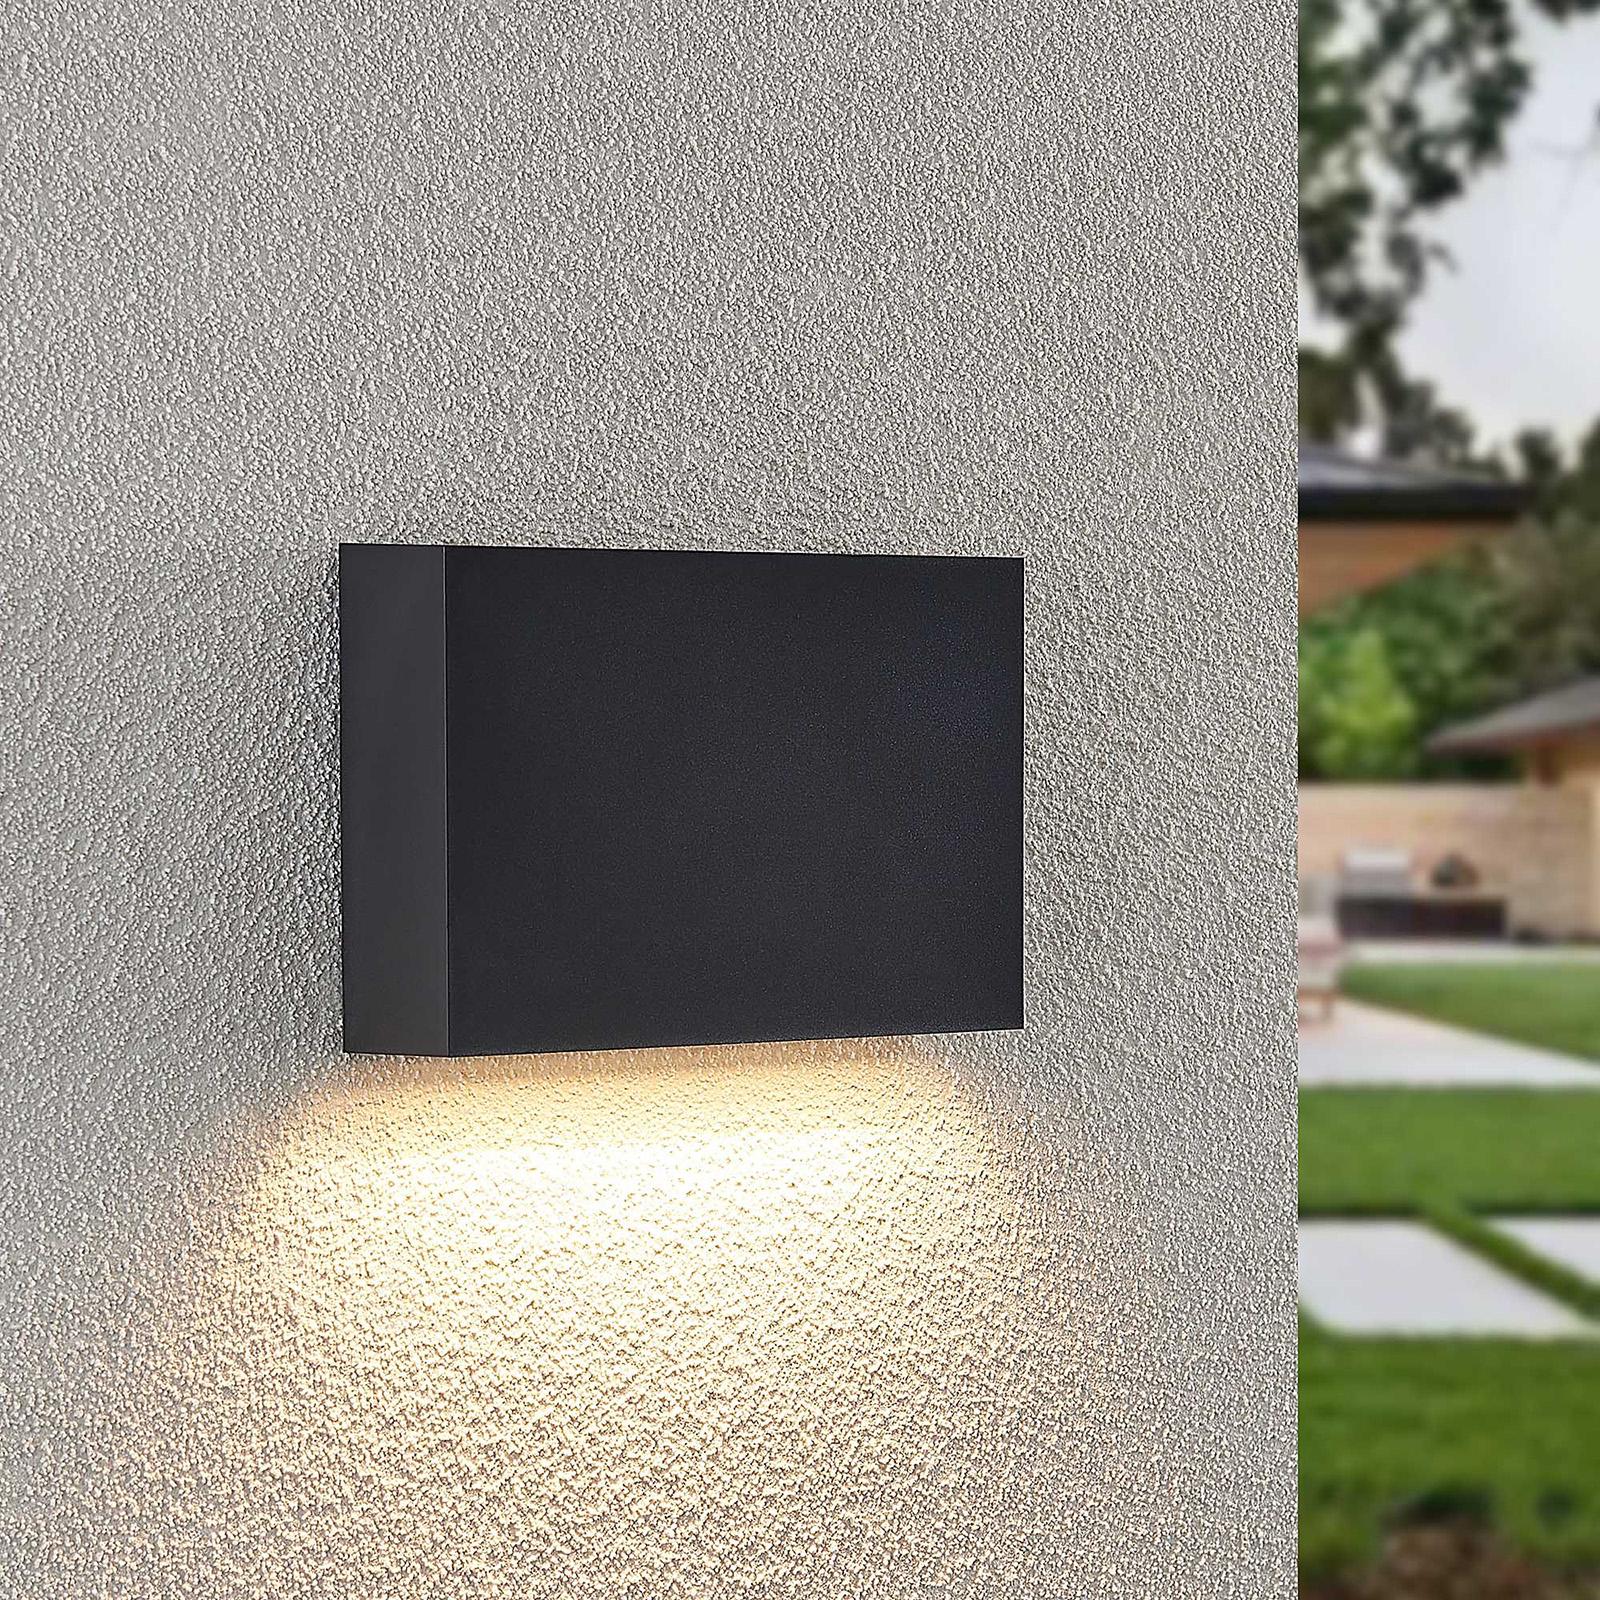 Lindby Jarte LED outdoor wall light, 20 cm down_9949059_1